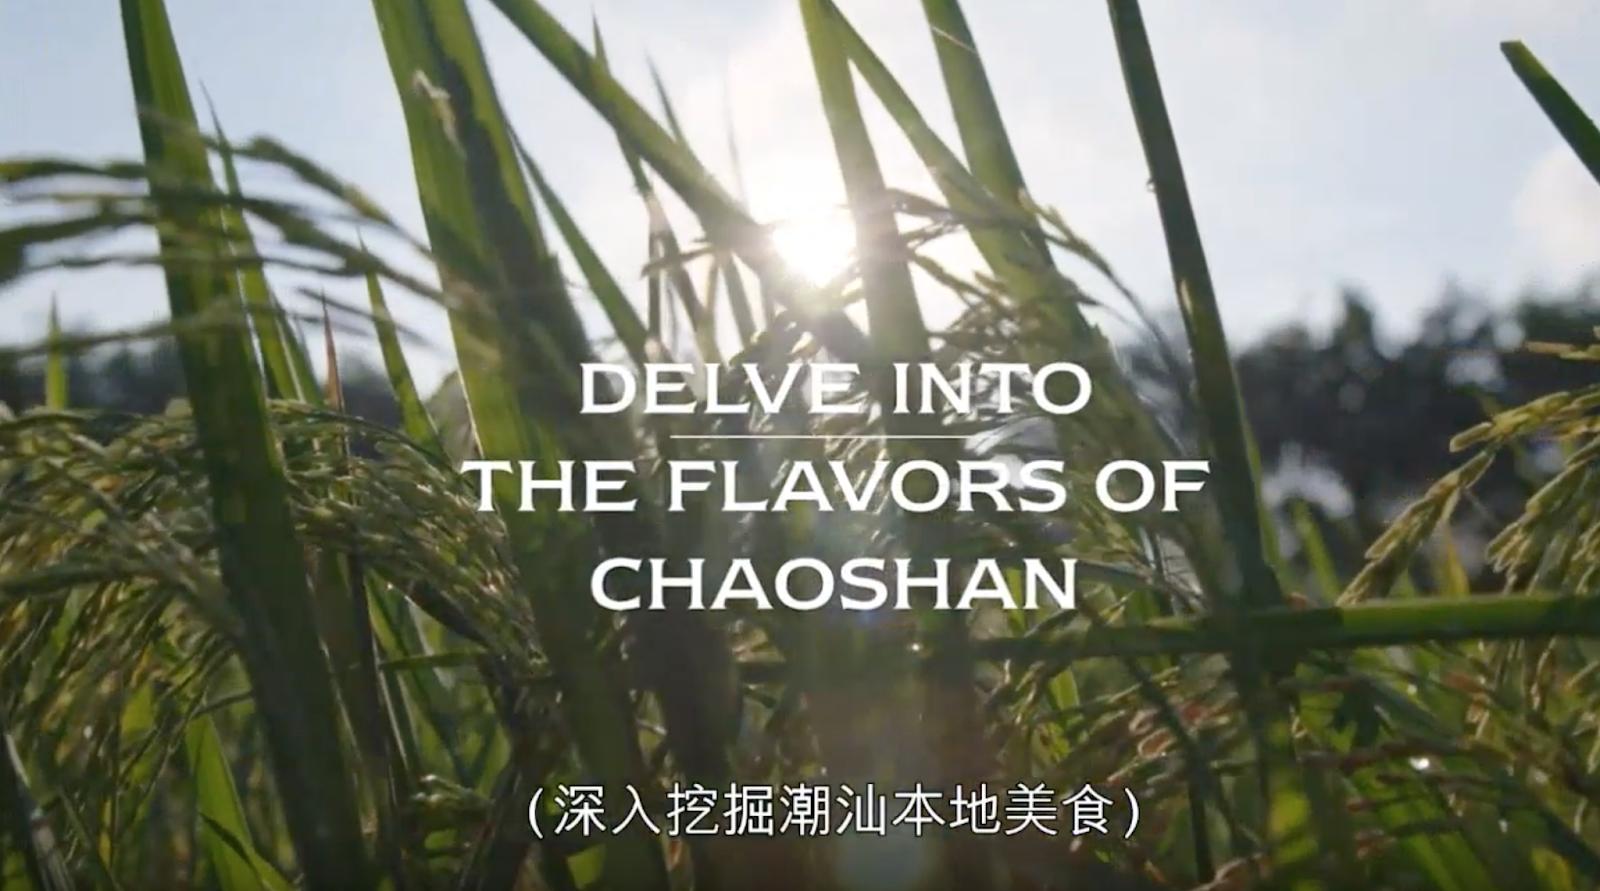 eat, drink, men, women 飲食男女: chaoshan 潮汕 and vicinity food